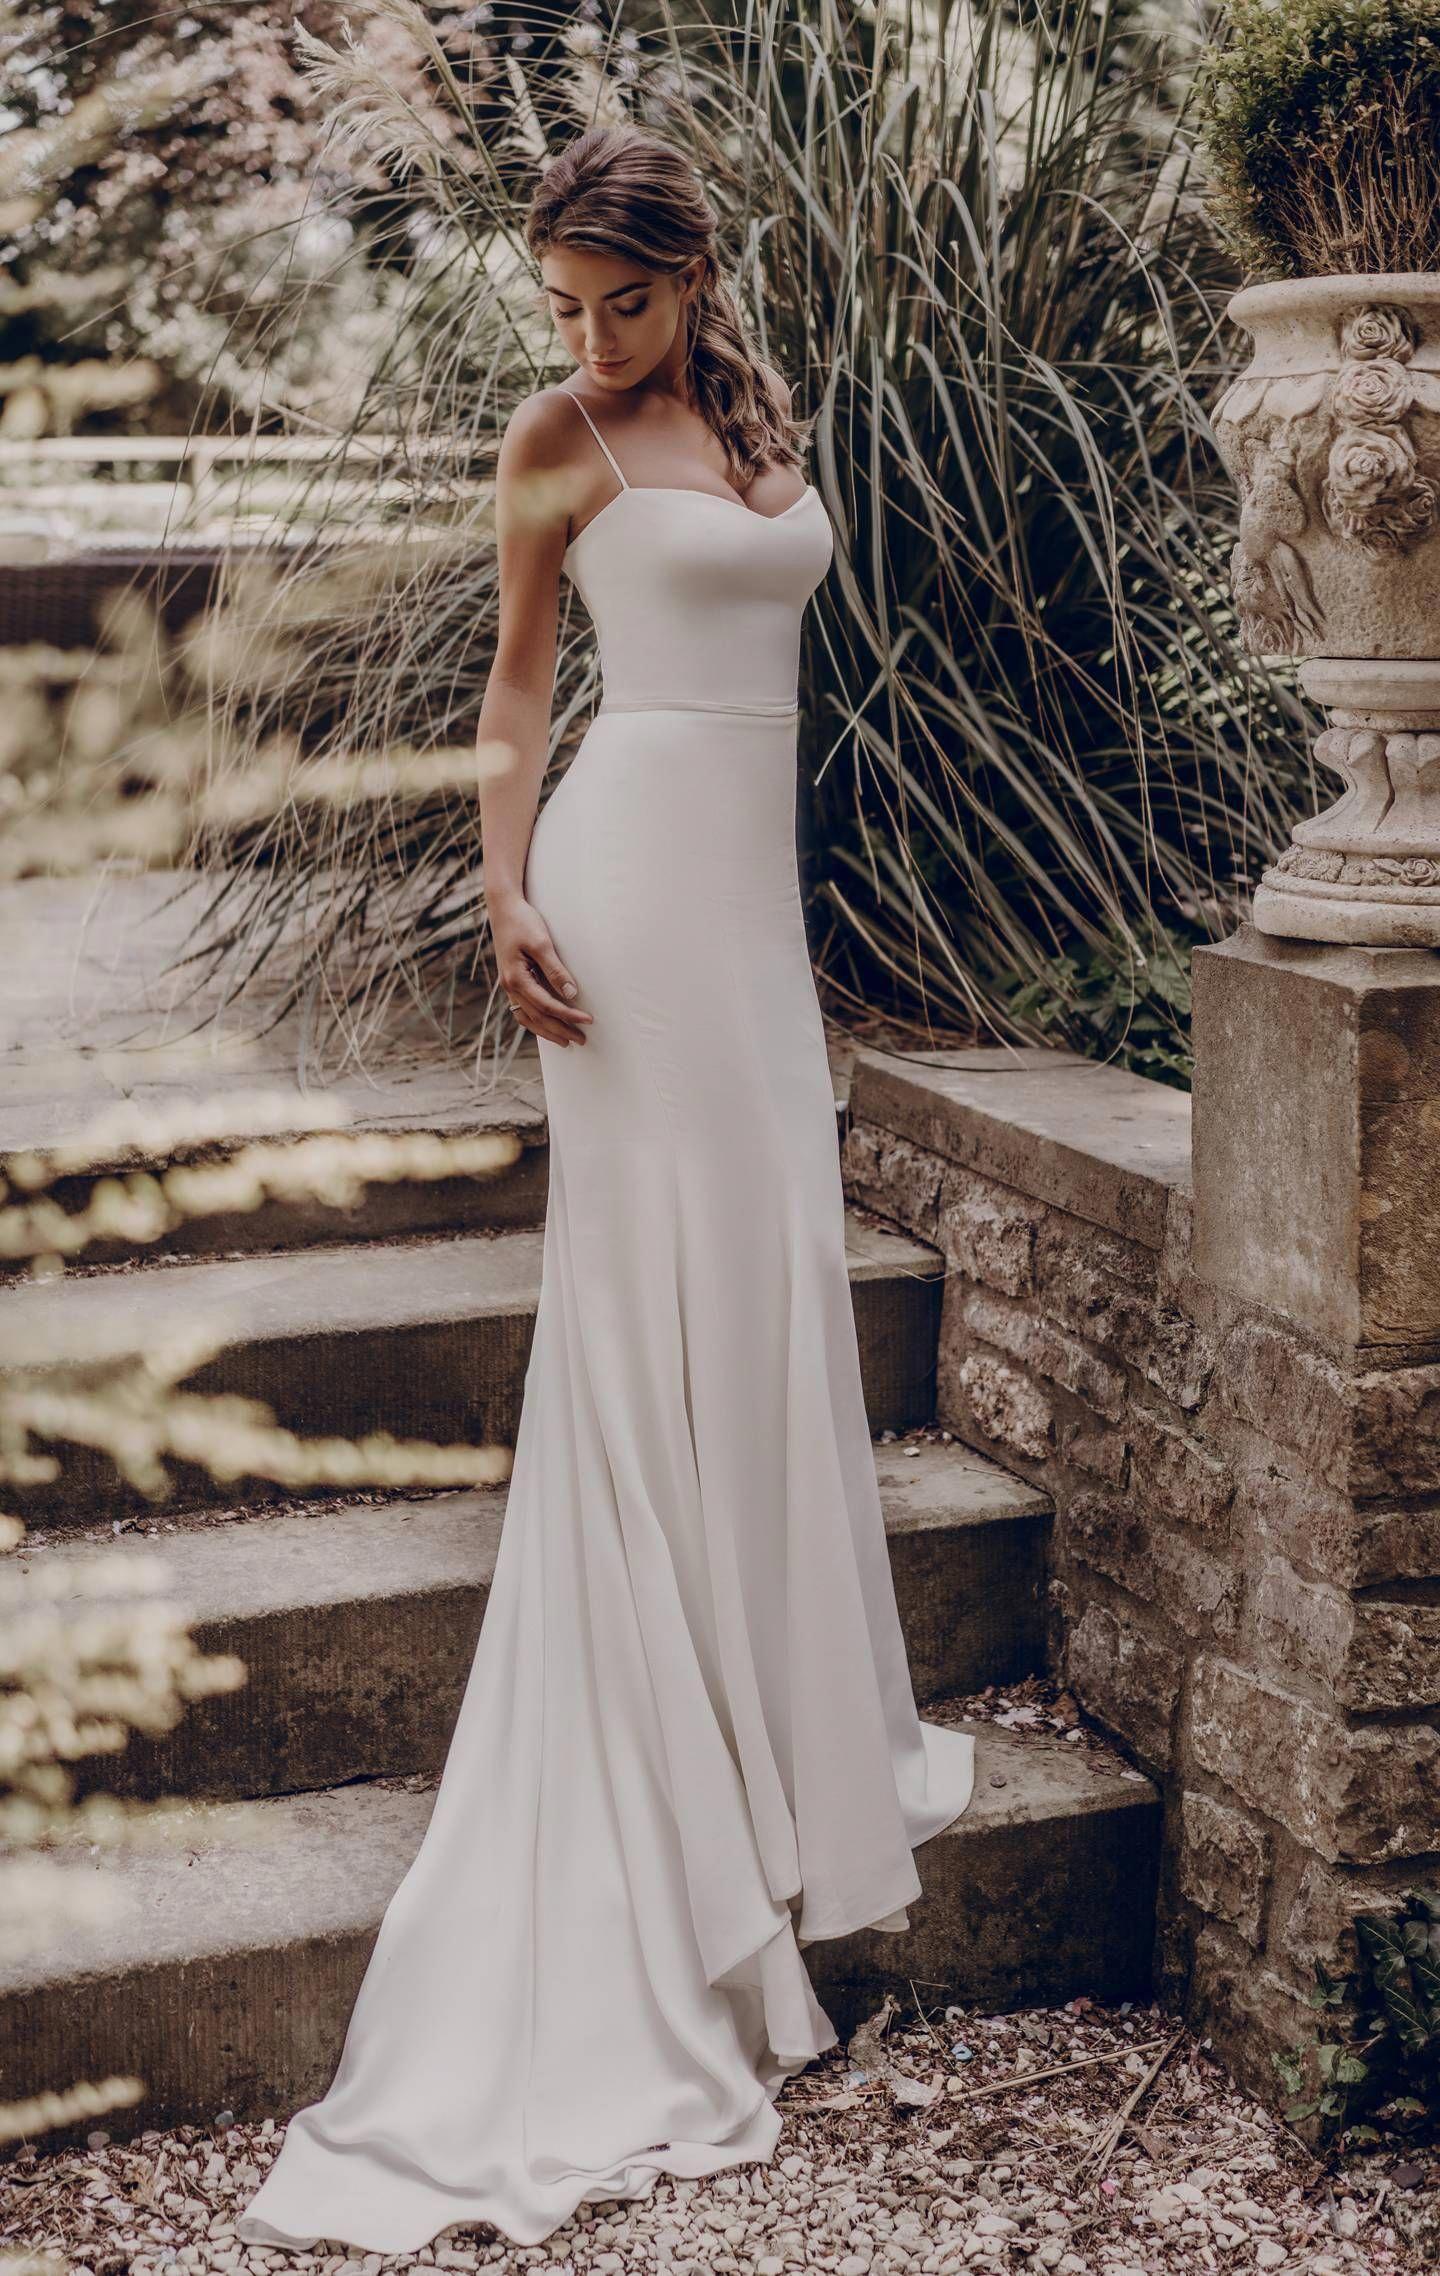 Simple And Plain Wedding Dresses Brides Magazine Weddingdresses Mermaid Long Bridesmaid Dresses Ivory Prom Dresses Wedding Dresses [ 2276 x 1440 Pixel ]